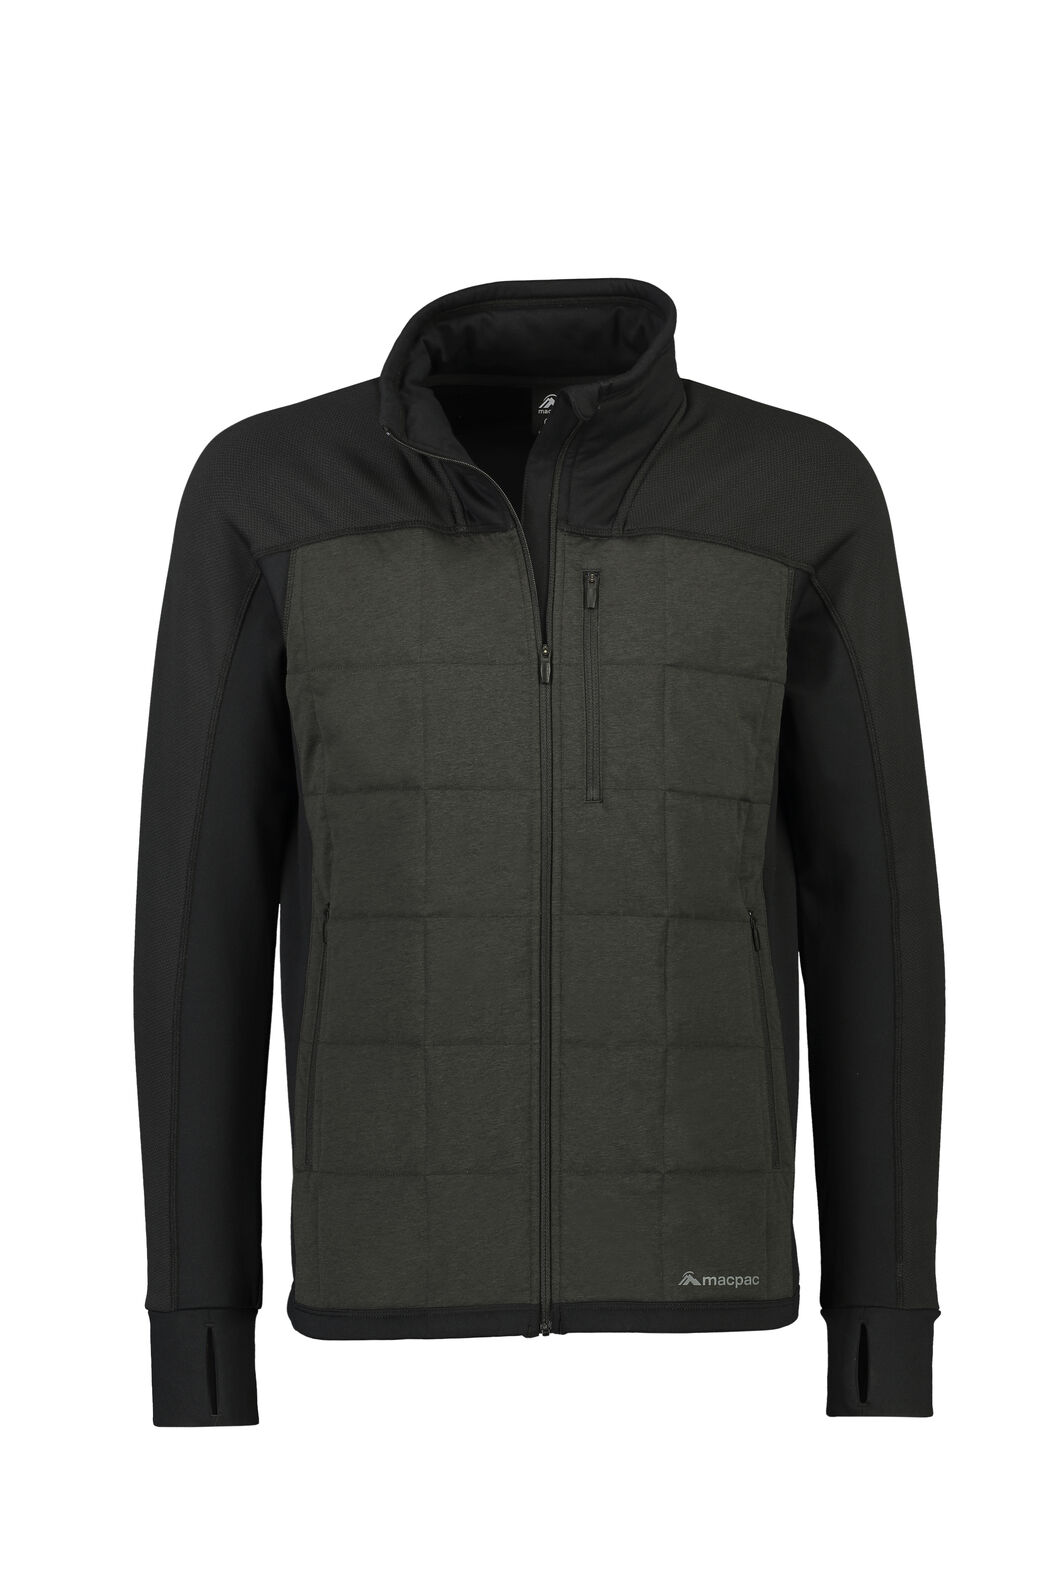 Macpac Accelerate PrimaLoft® Jacket - Men's, Black, hi-res